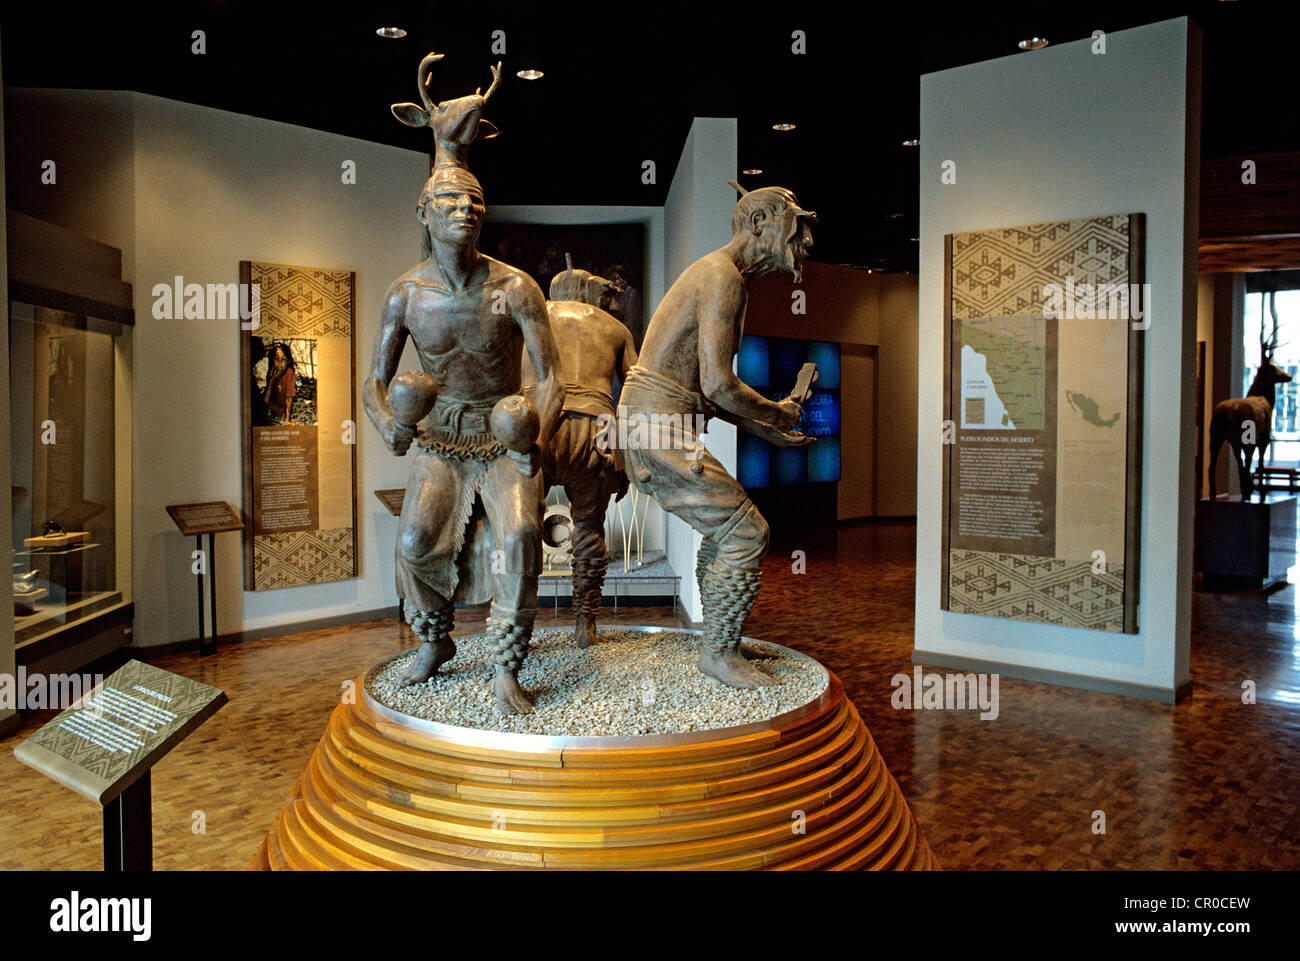 Mexico Federal District Mexico City Museo Nacional de Antropología MNA or National Museum of Anthropology scene - Stock Image